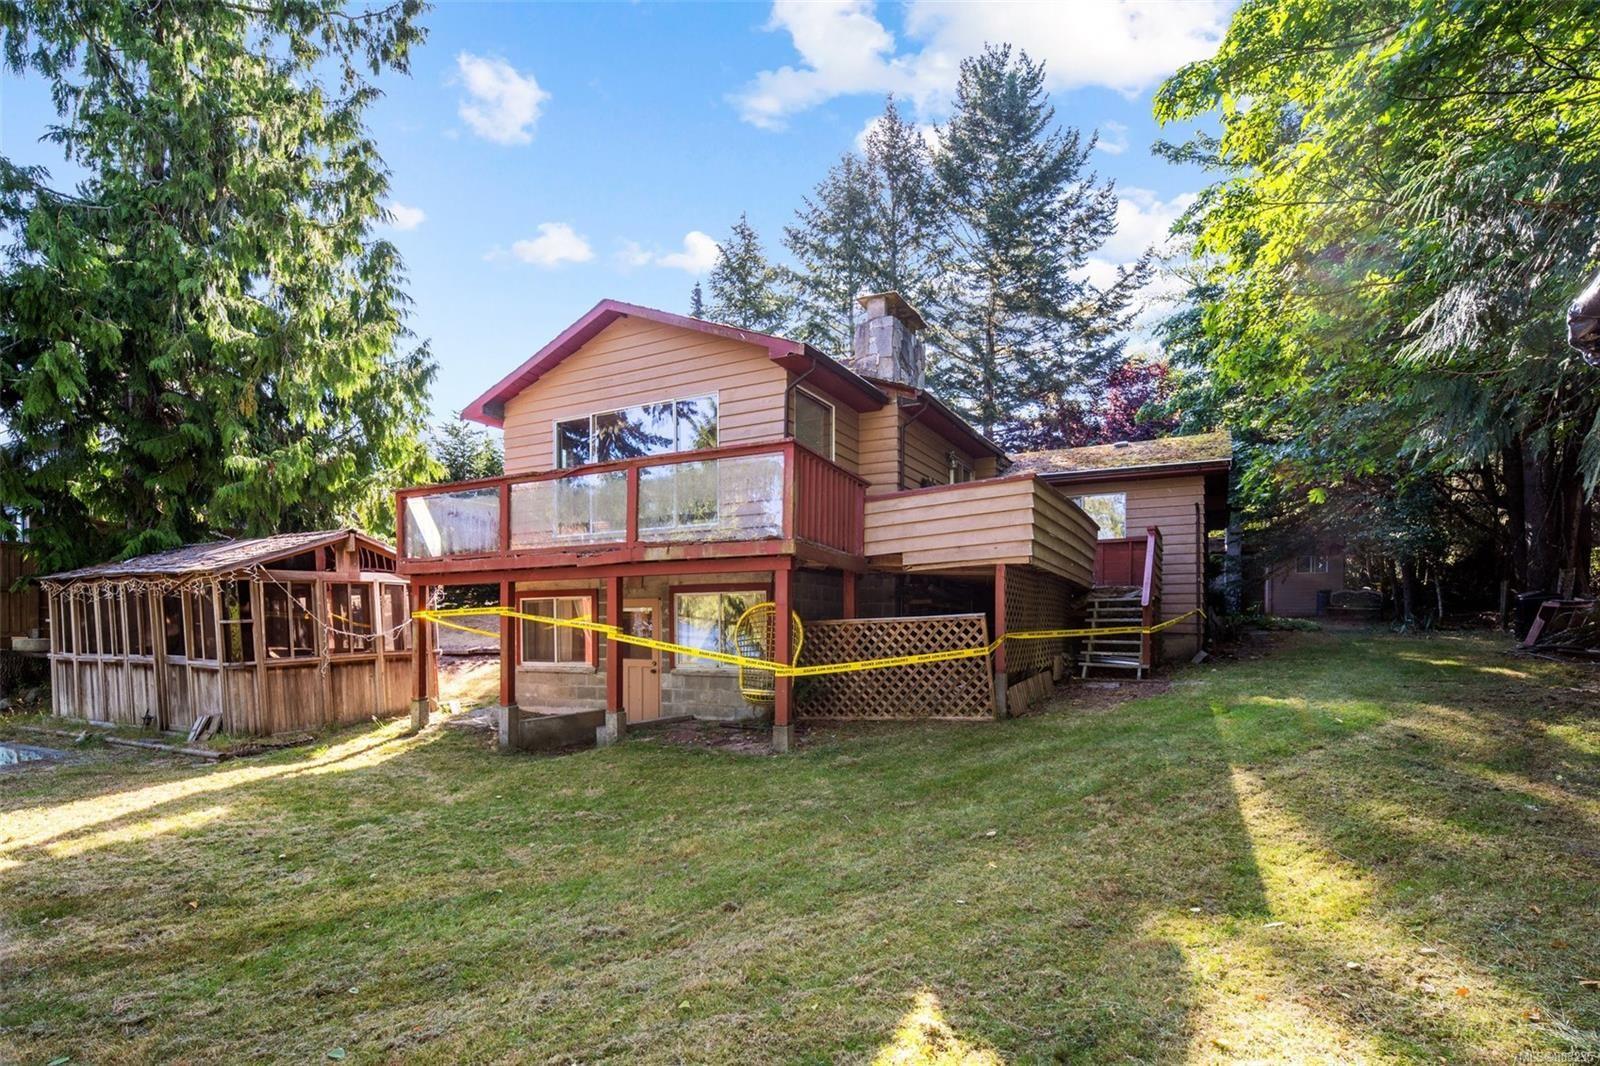 Photo 11: Photos: 6542 Thornett Rd in : Sk East Sooke House for sale (Sooke)  : MLS®# 883235